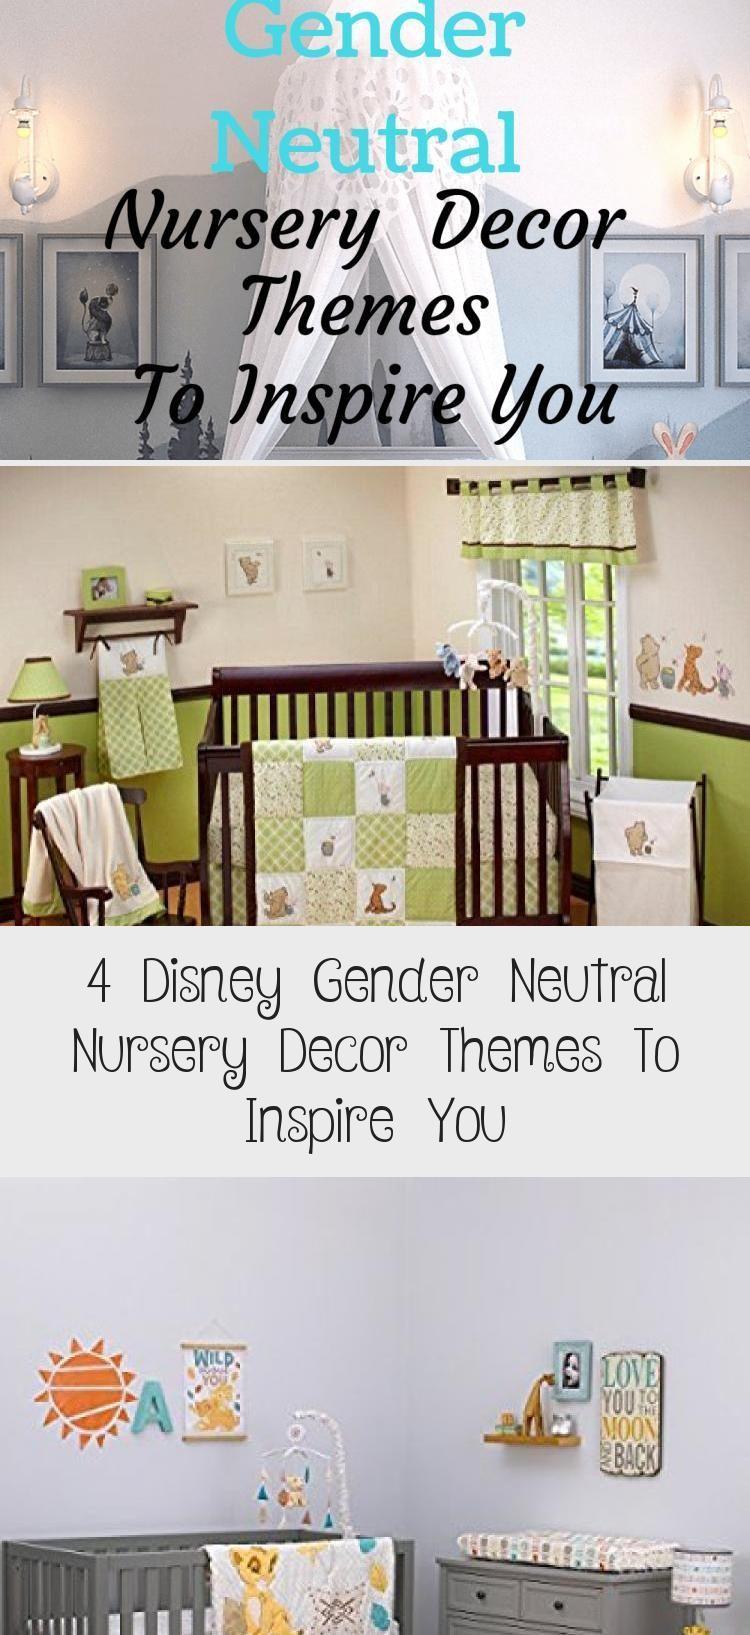 4 Disney Gender Neutral Nursery Decor Themes To Inspire You Baby Care Baby Ca Baby Ca Gender Neutral Nursery Decor Nursery Decor Neutral Nursery Neutral